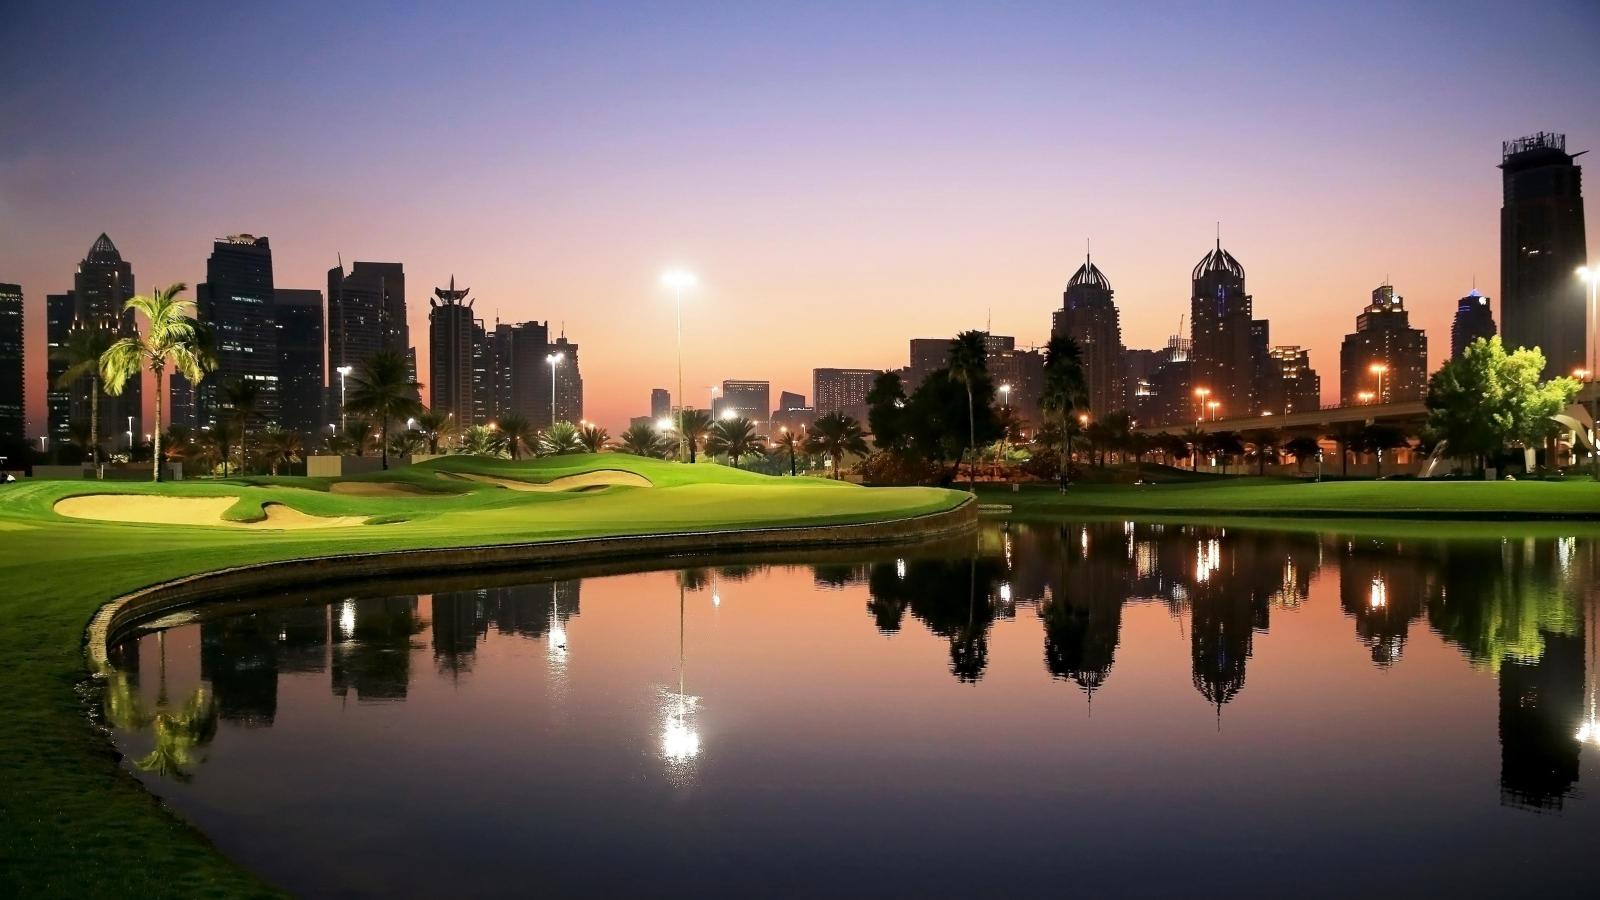 Emirates Golf Club Faldo Course Book Golf Online